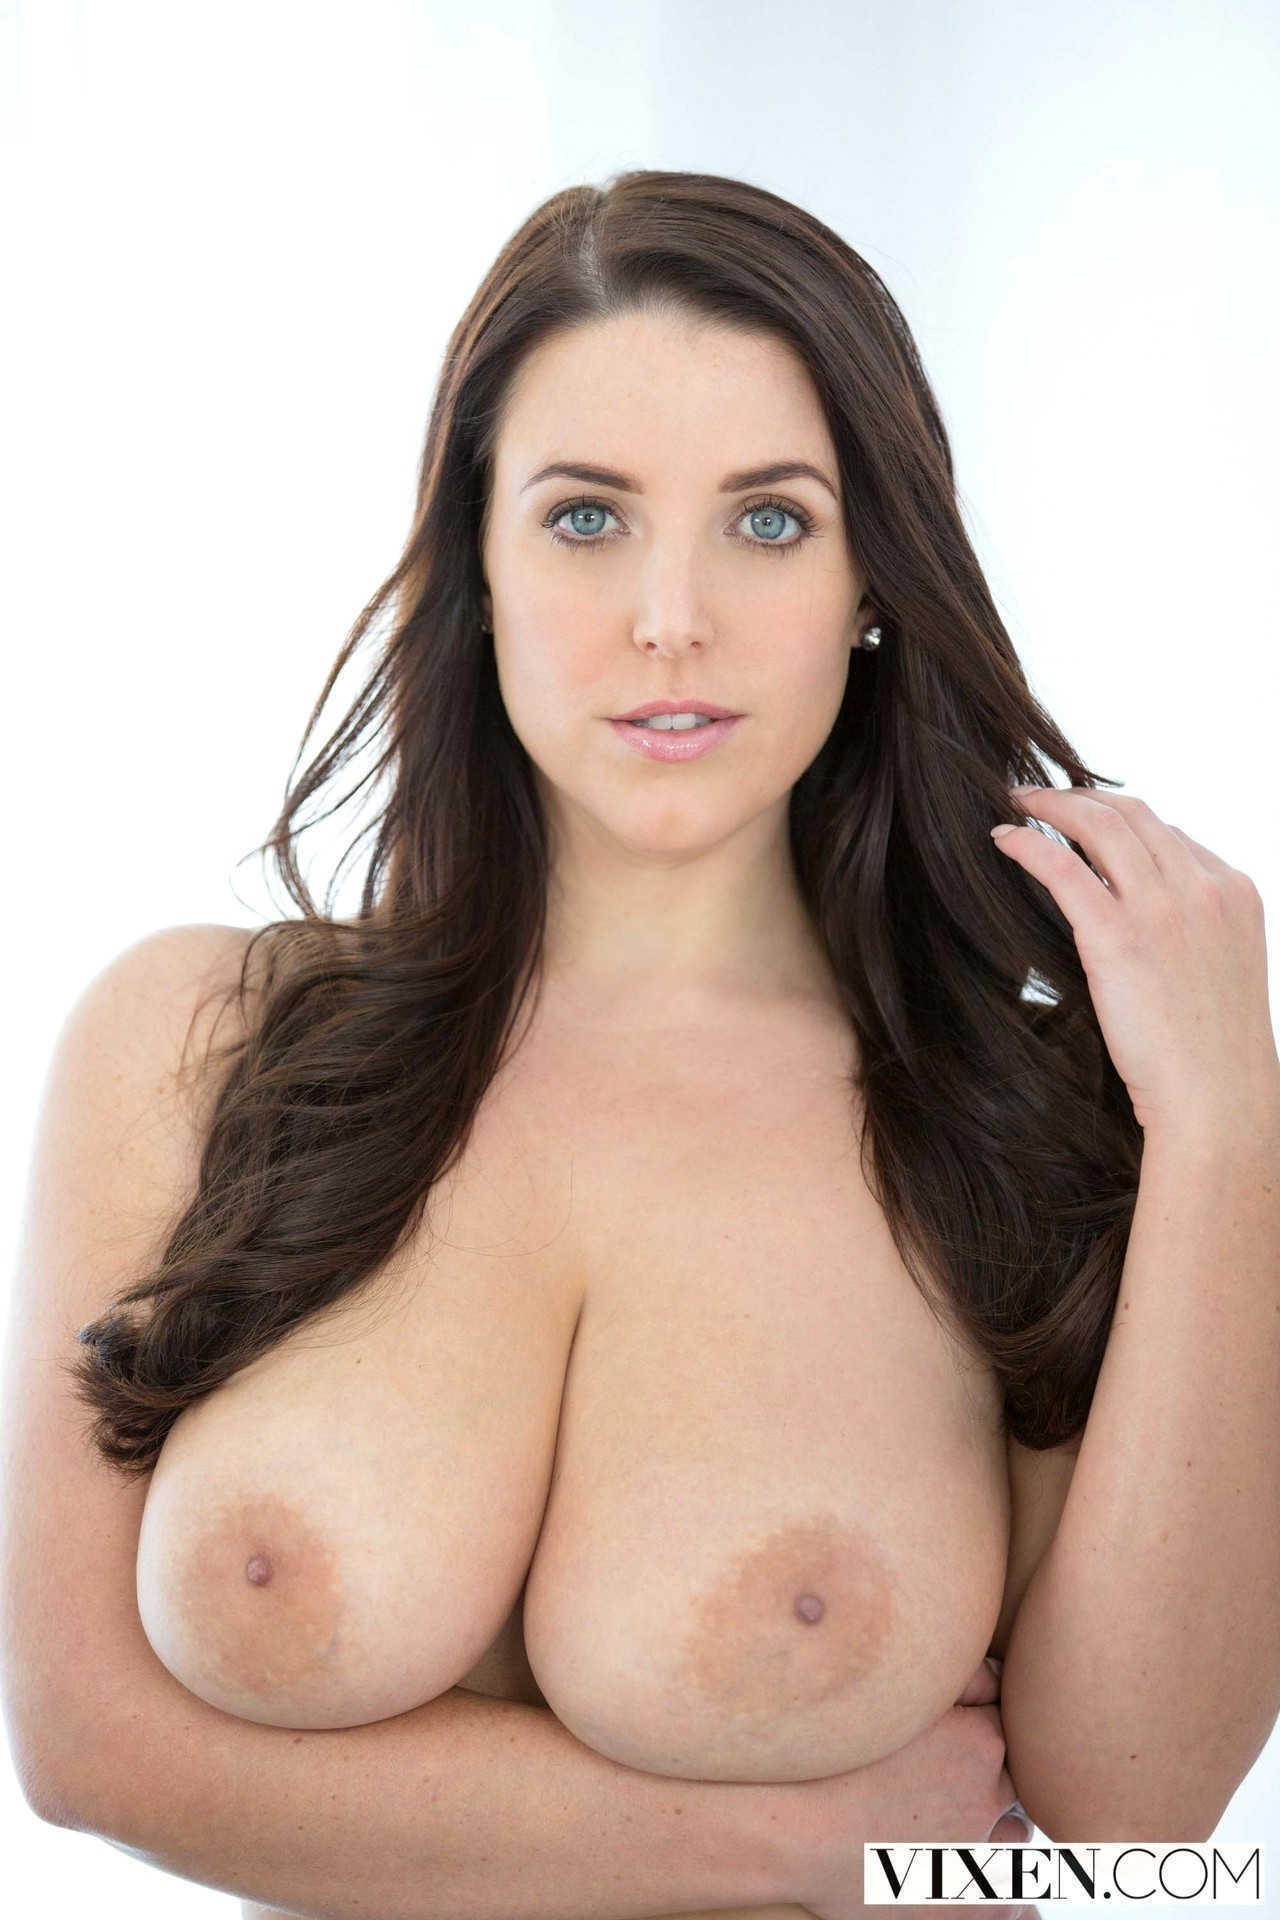 Sexy ladys nudes amateurs serie